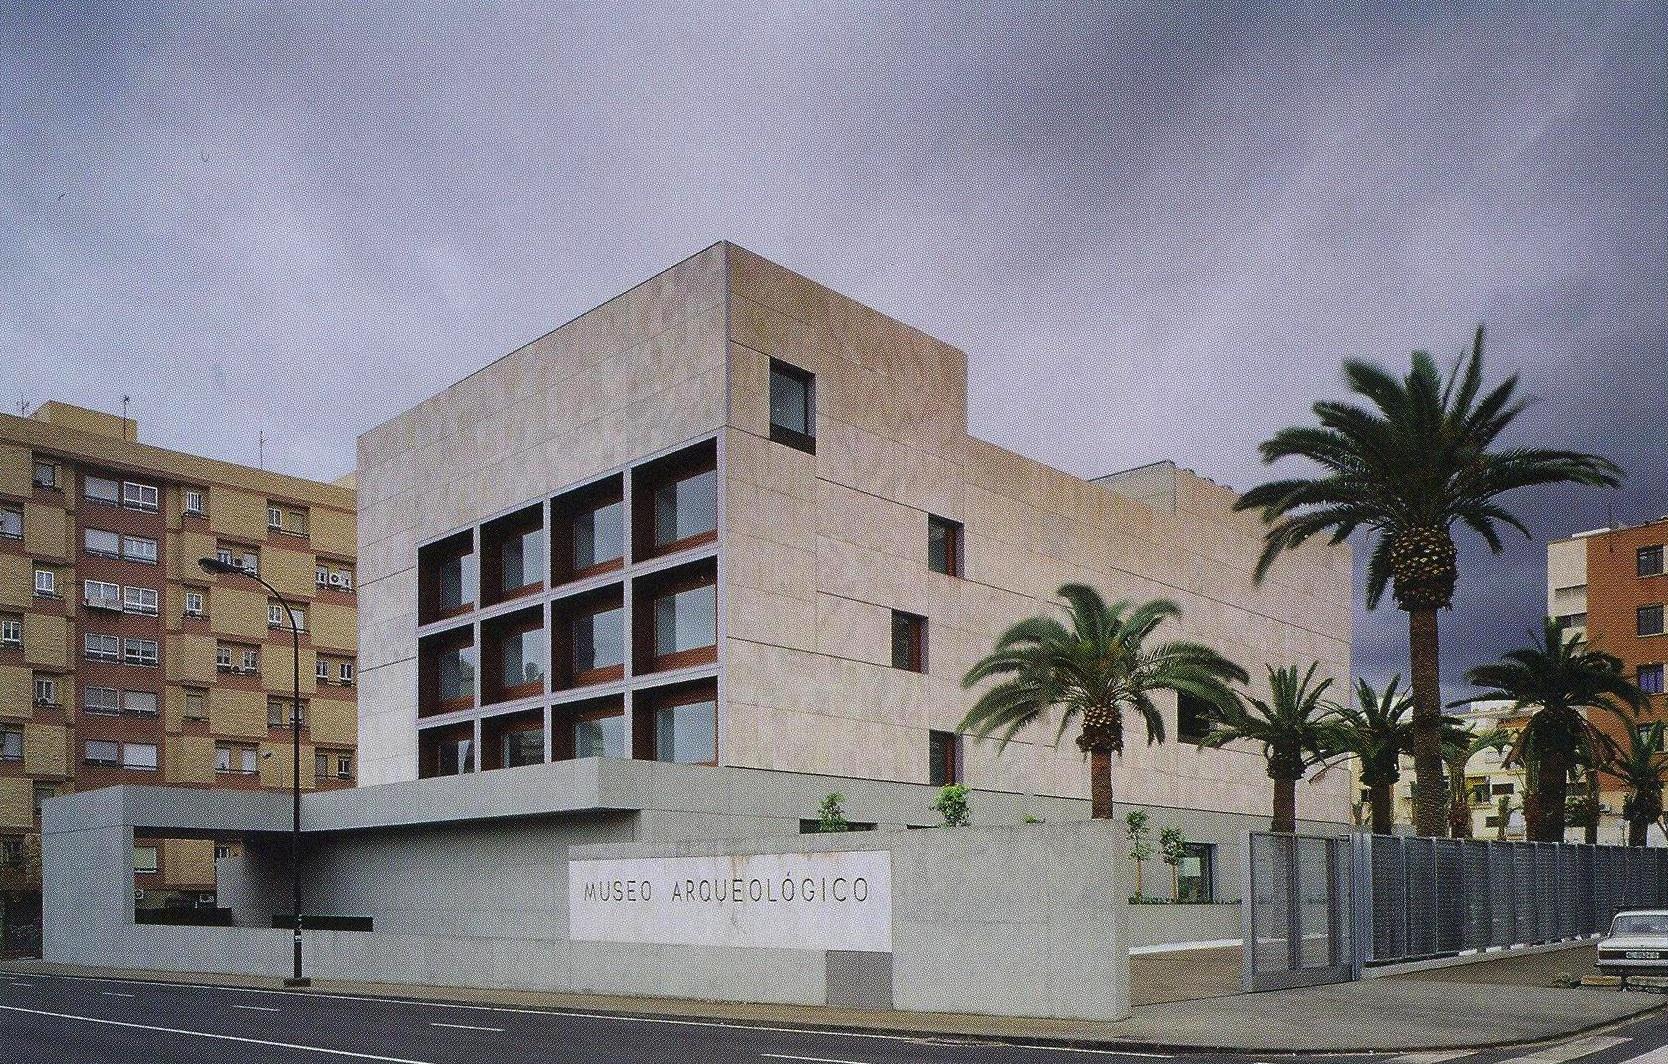 Museo arqueológico de Almería archaeological museum